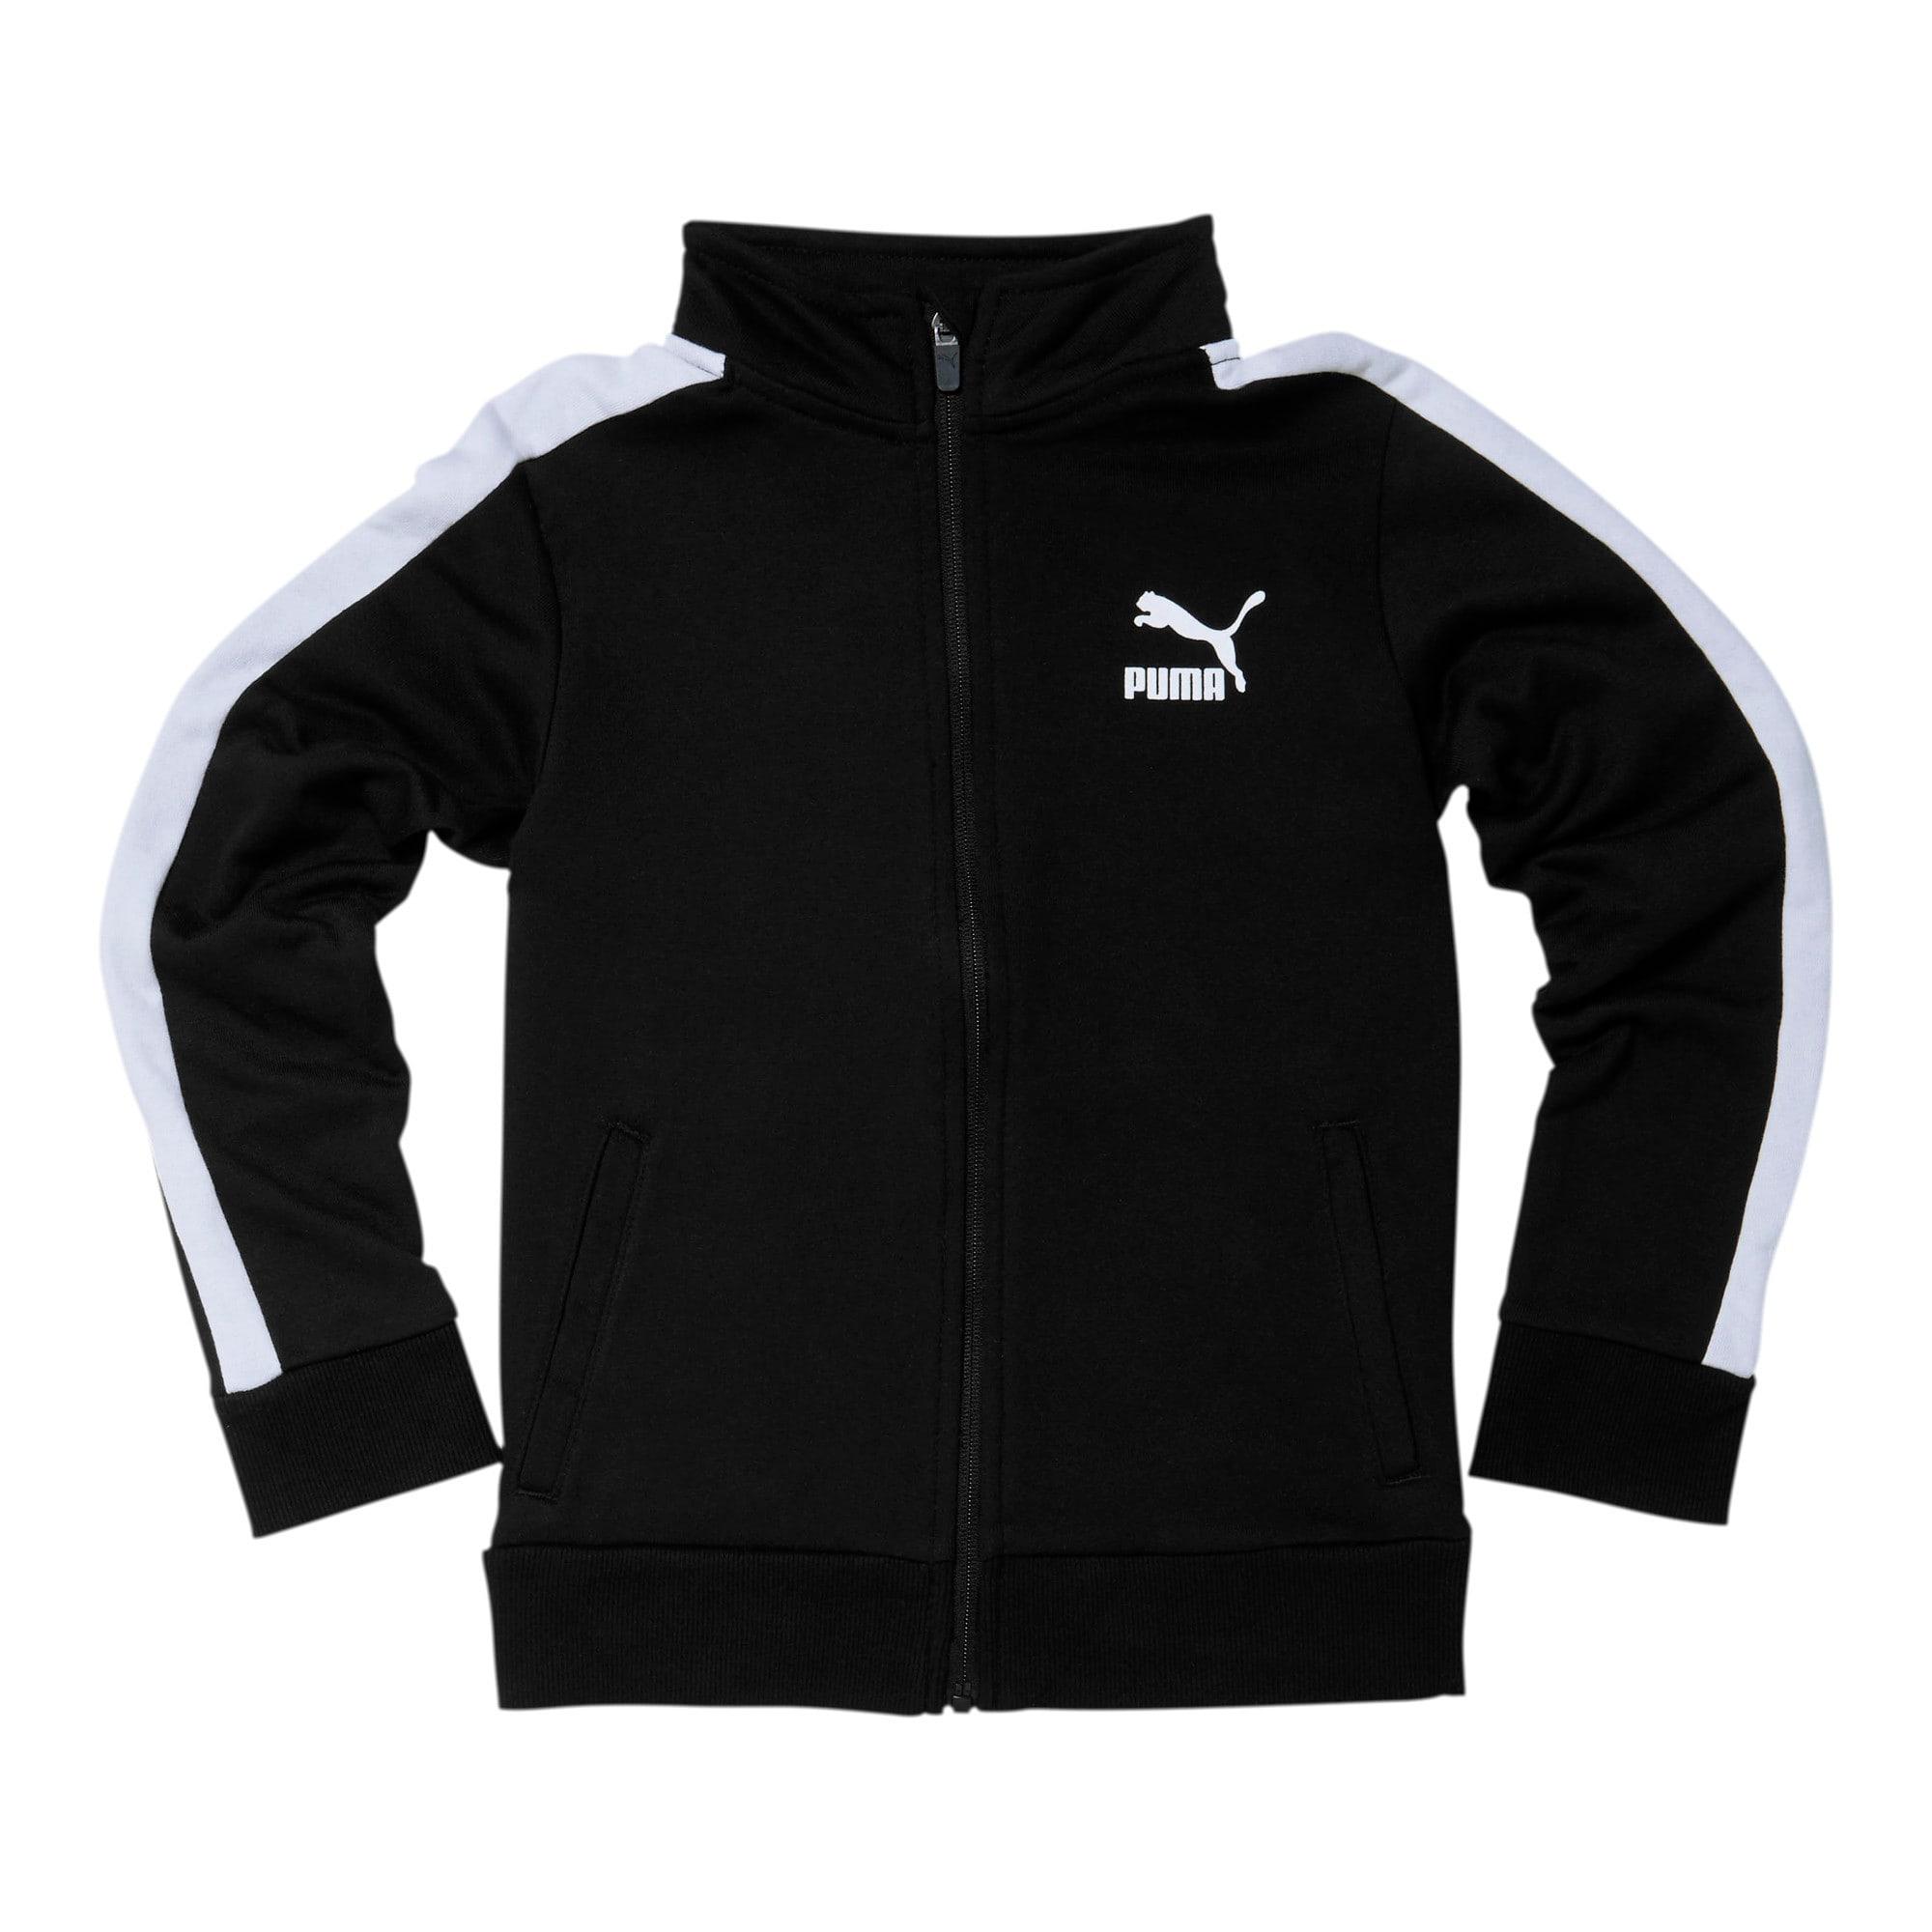 Thumbnail 1 of Boys' T7 Track Jacket JR, PUMA BLACK/WHITE, medium